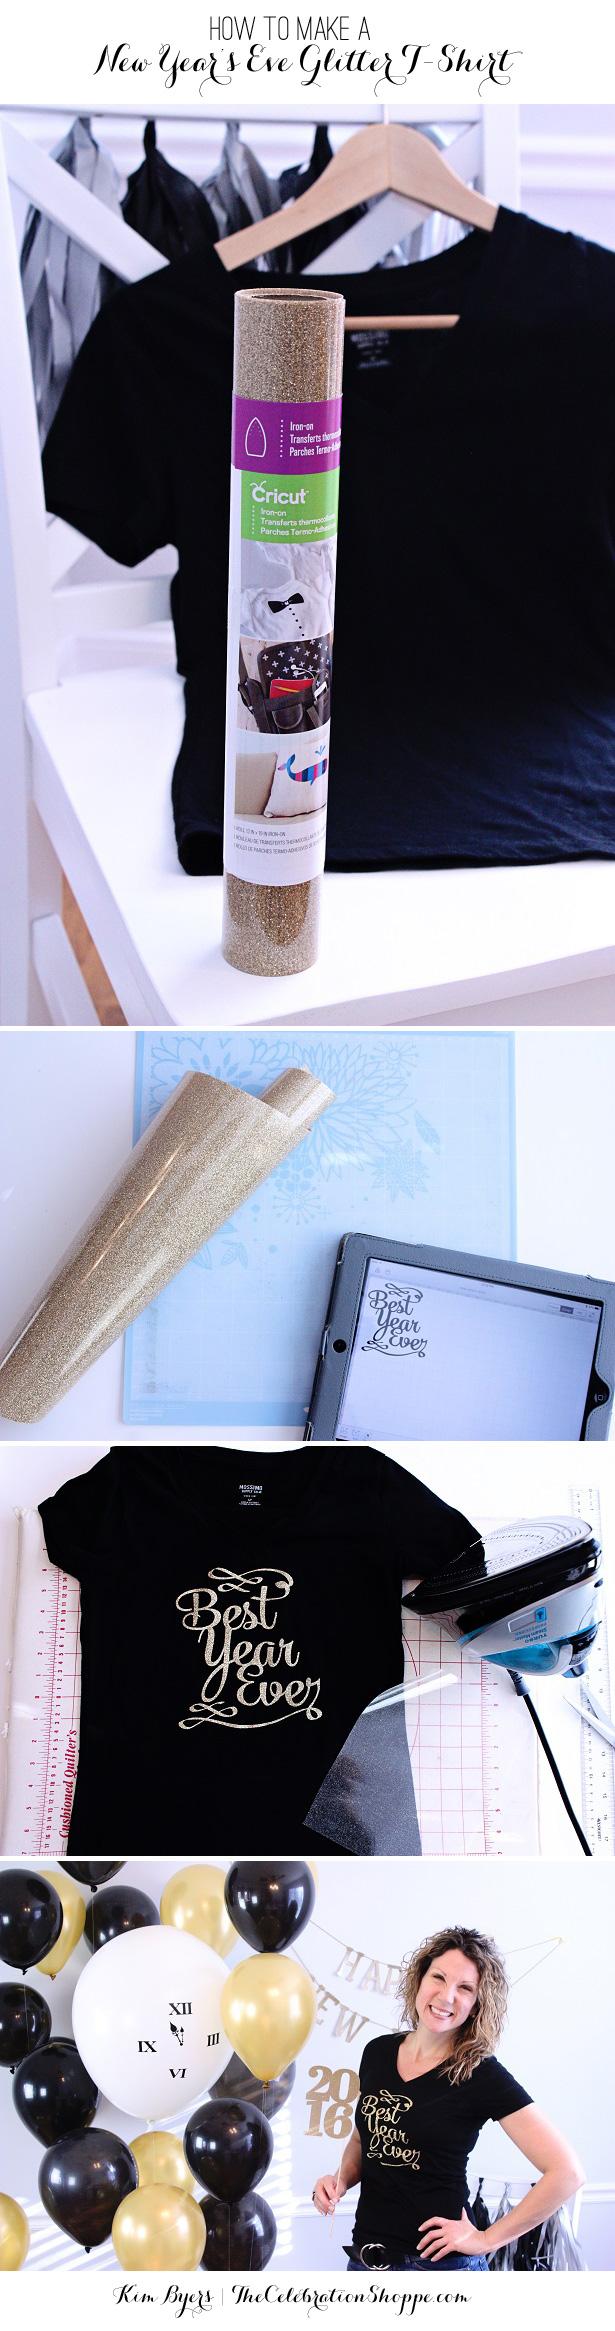 Make A New Year's Eve Glitter Iron-On T-Shirt | @kimbyers TheCelebrationShoppe.com